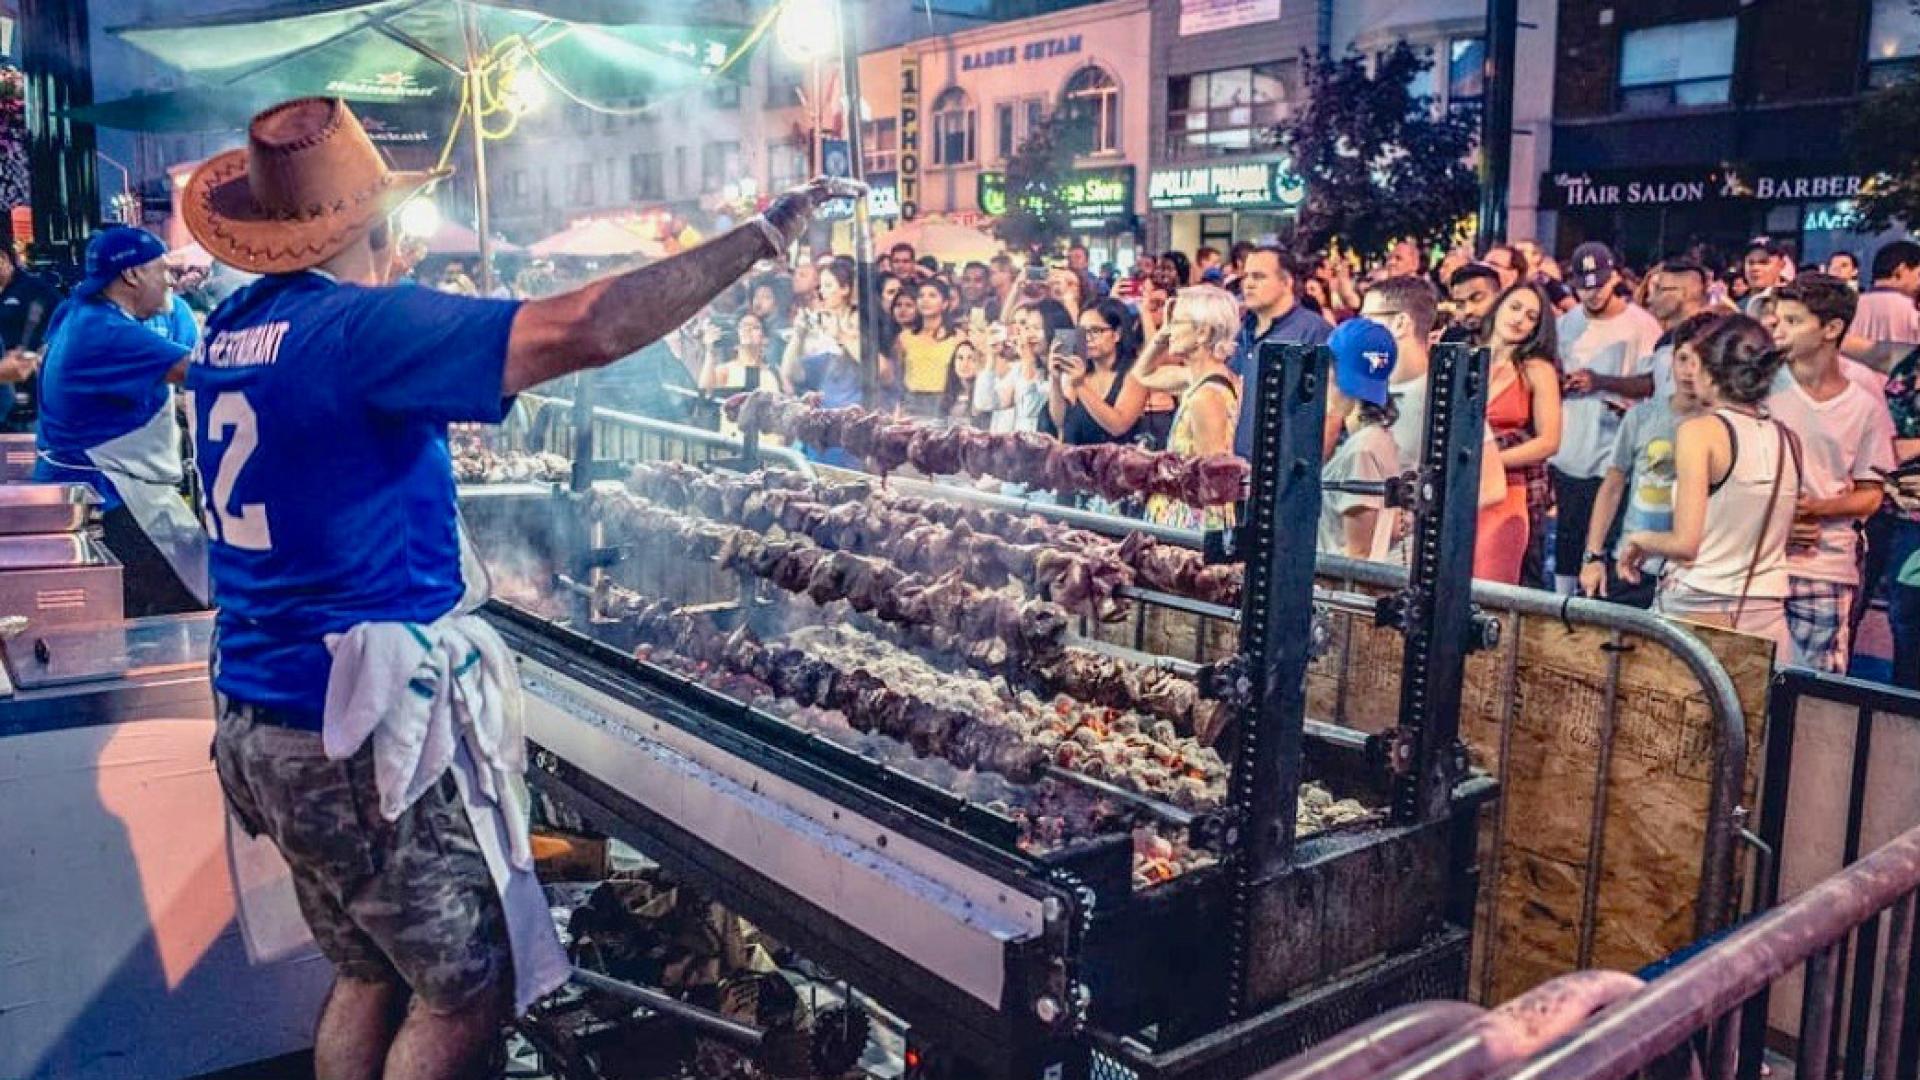 Taste of the Danforth Toronto Festivals Toronto events next 14 days